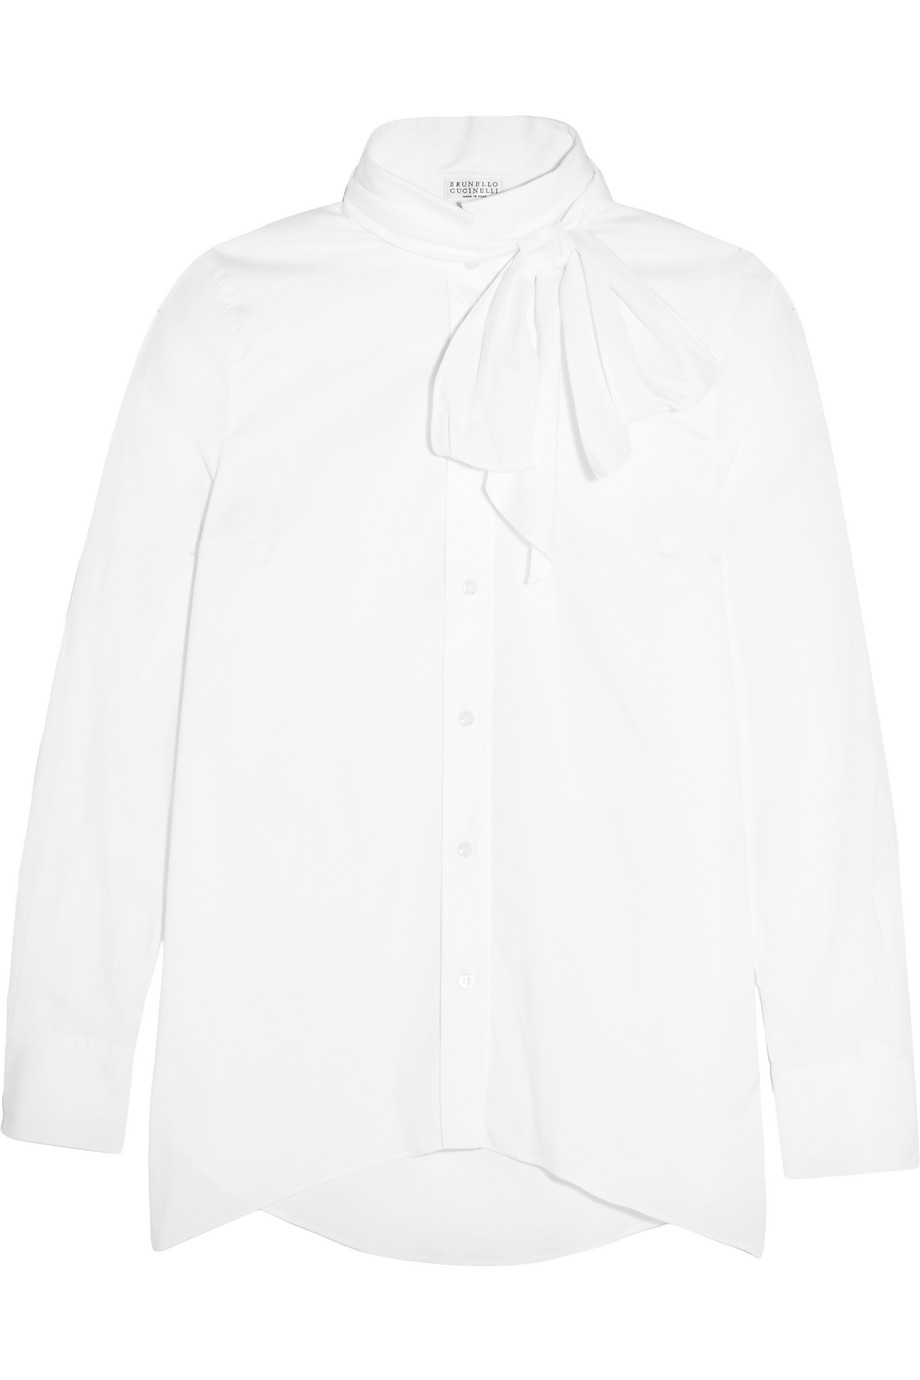 Pussy-Bow Stretch-Cotton Poplin Shirt, Size: M